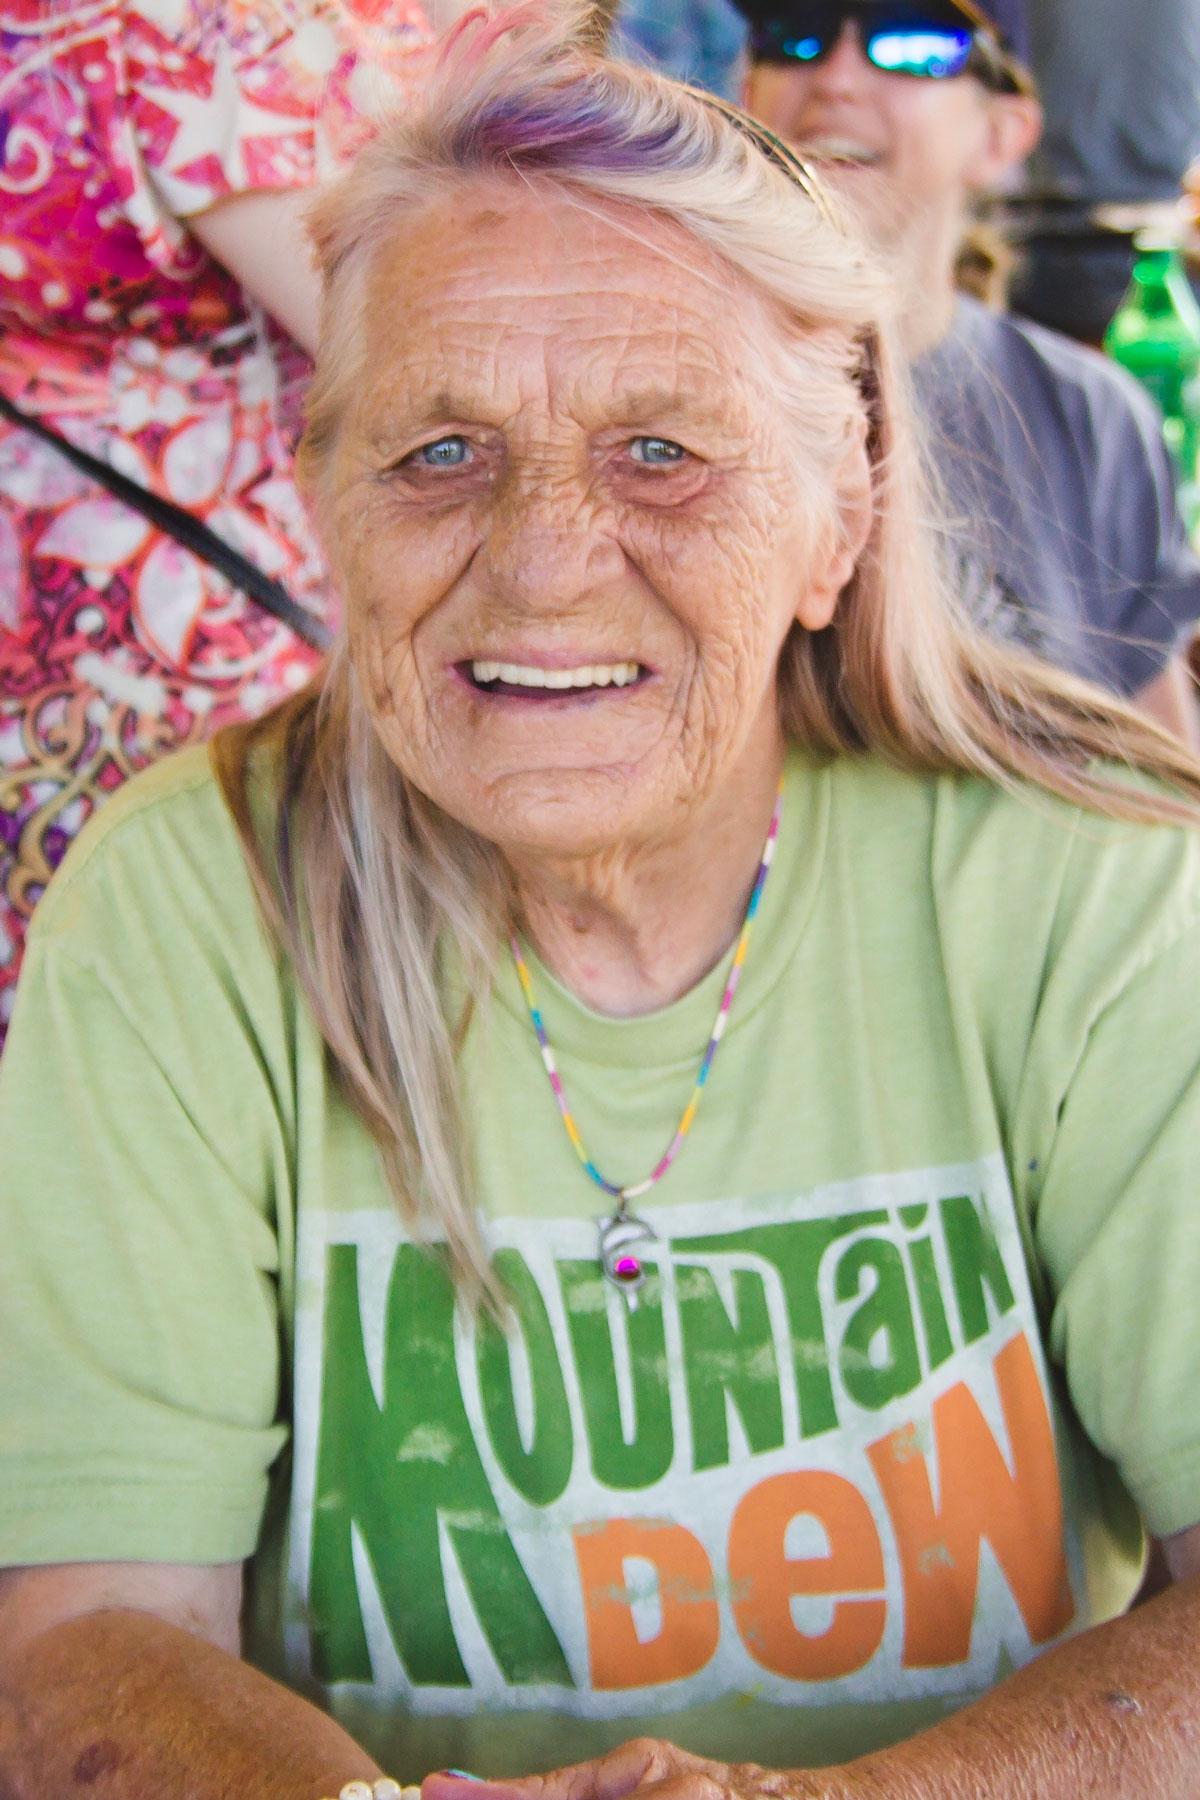 Smiling Senior Woman With Long Hair